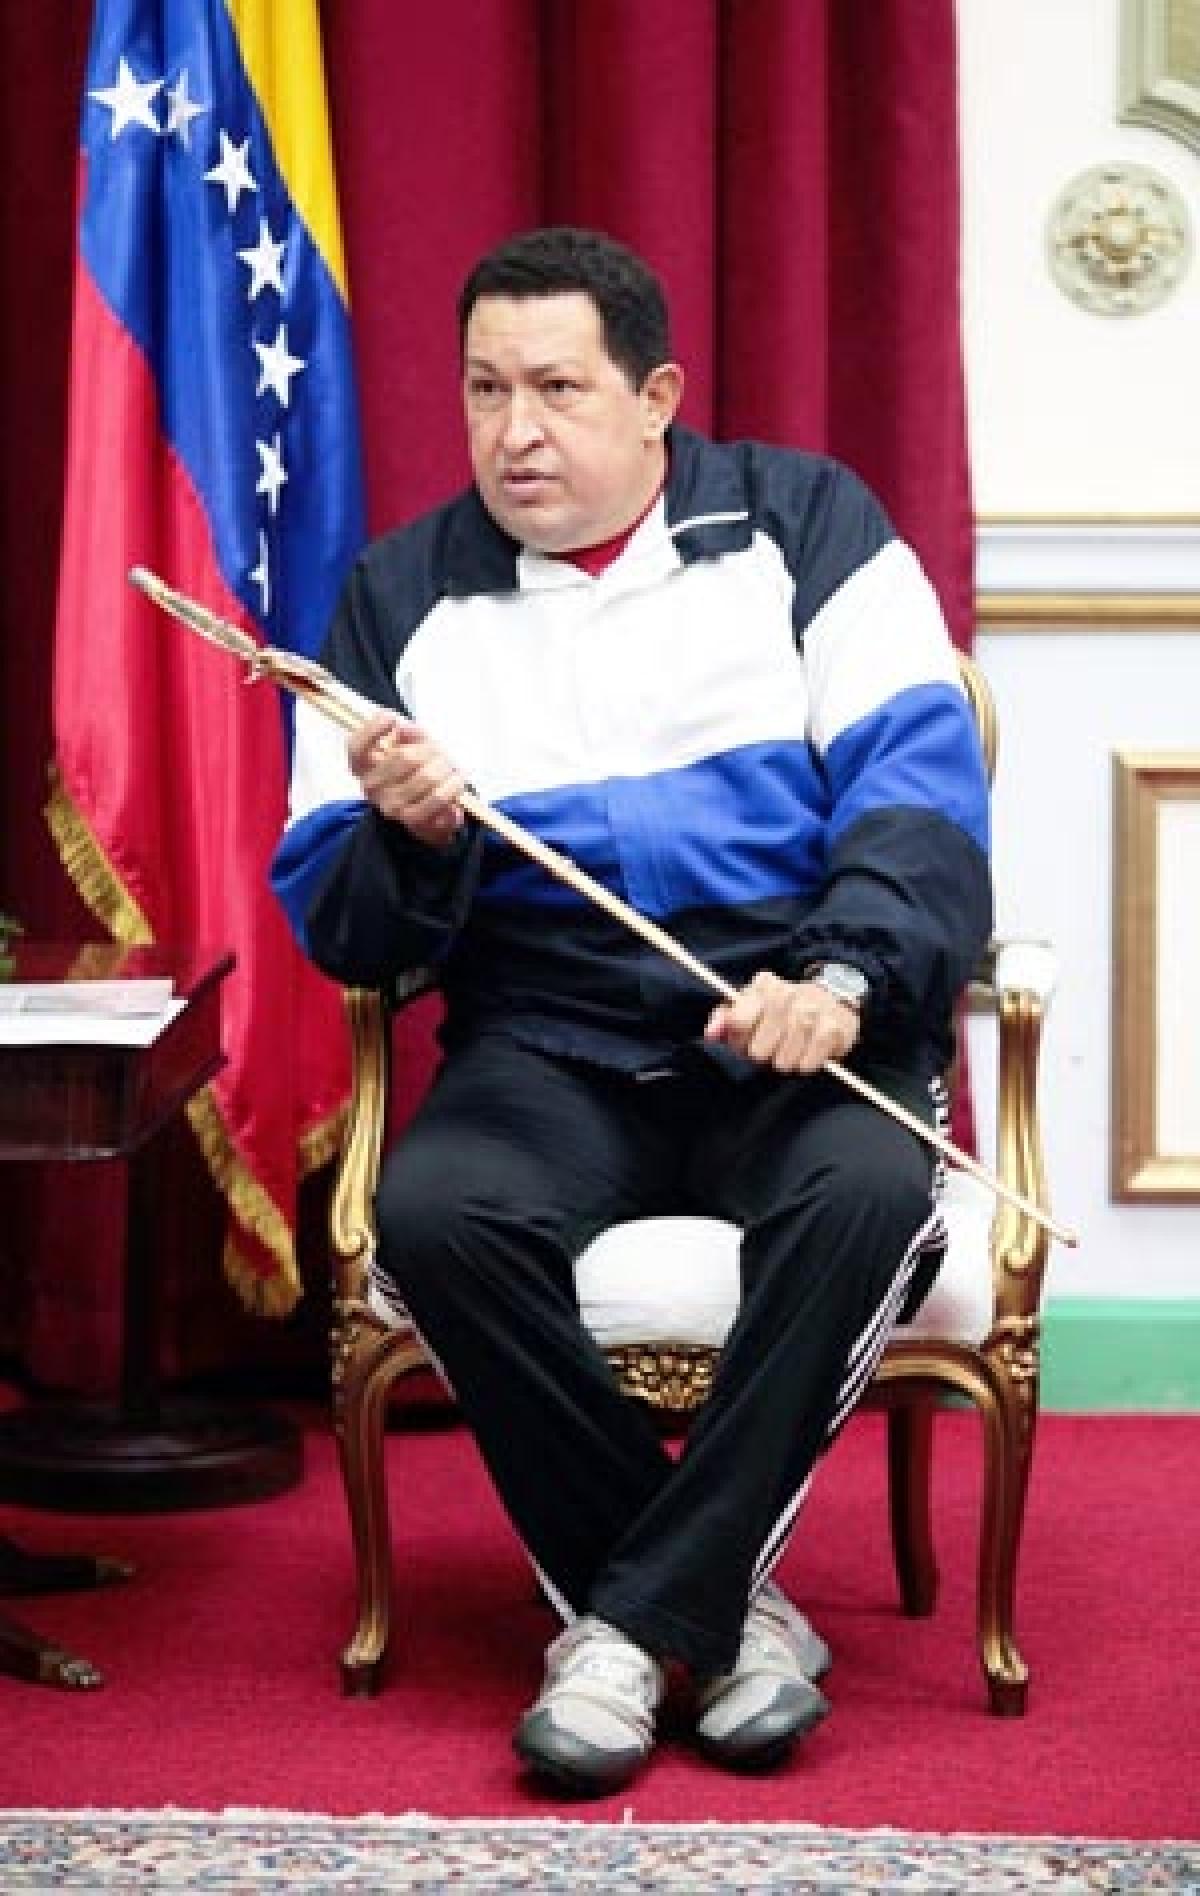 WORLD MOURNS CHAVEZ